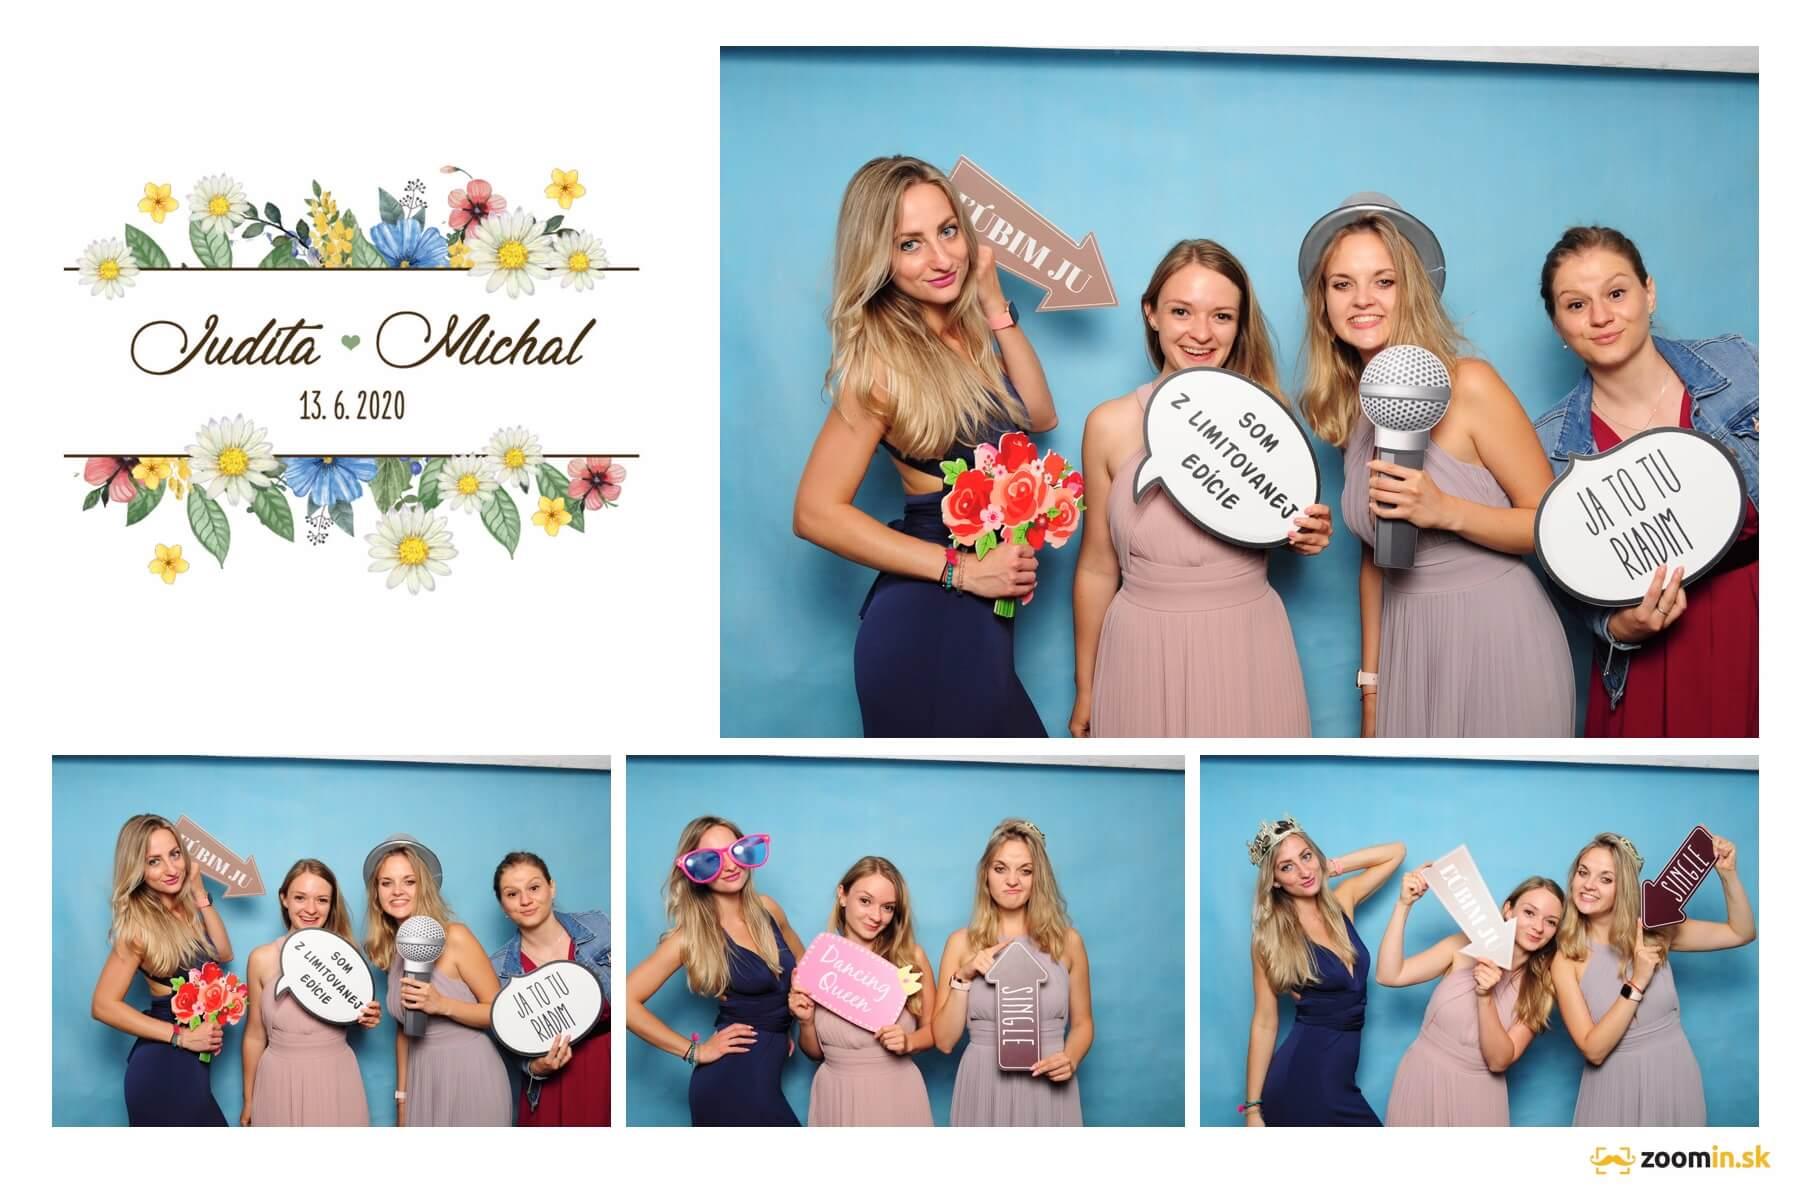 fotobudka, fotokutik, fotobox na svadbu